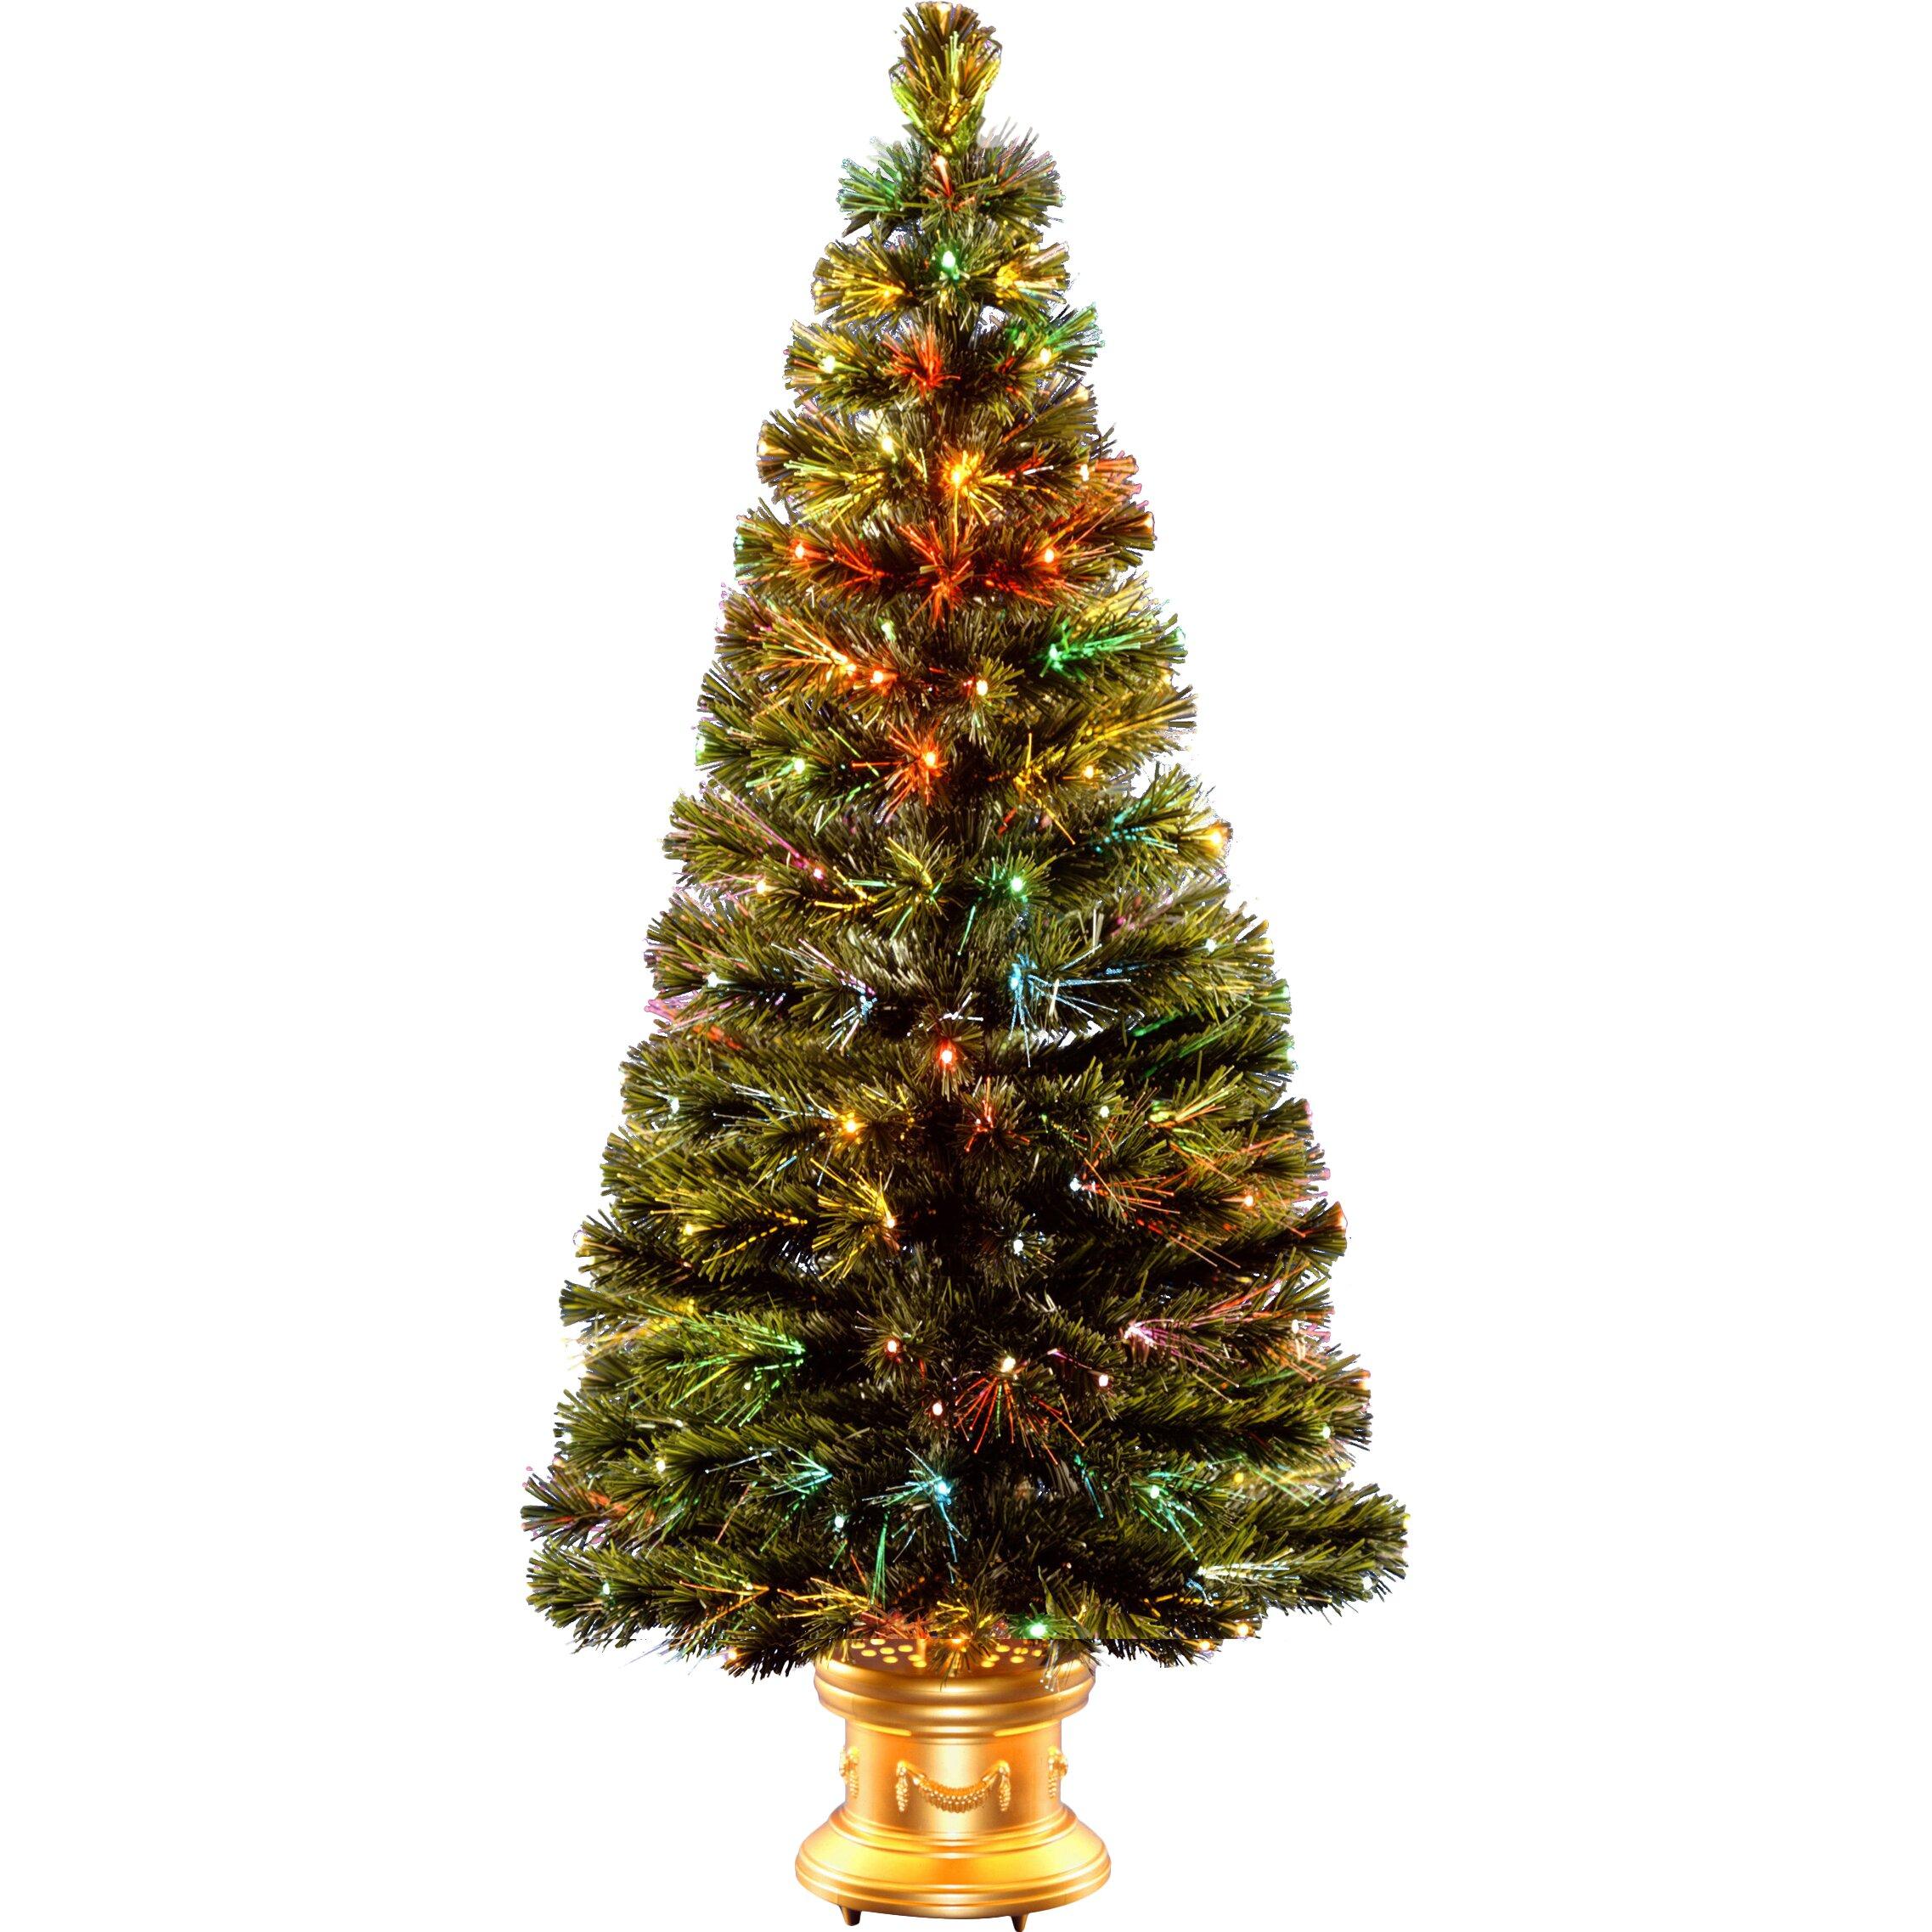 Christmas Tree Company Greytown : National tree co fiber optics radiance fireworks green